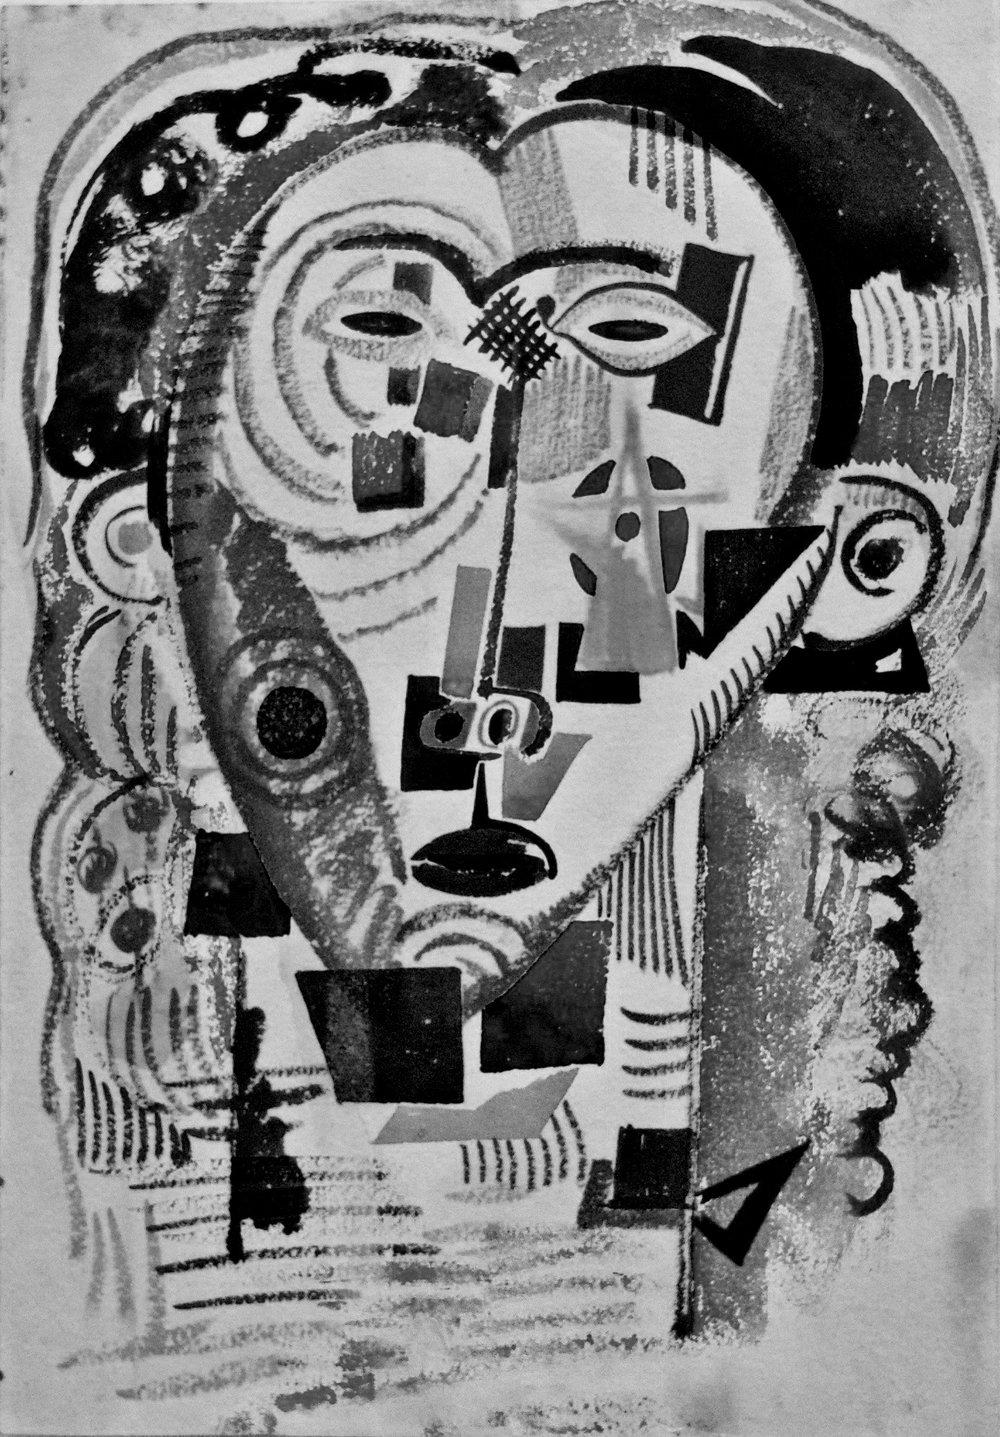 lLitoral_Head_(c.1914-1915)_-_Amadeu_de_Souza-Cardoso_(1887-1918)_(32824022542).jpg